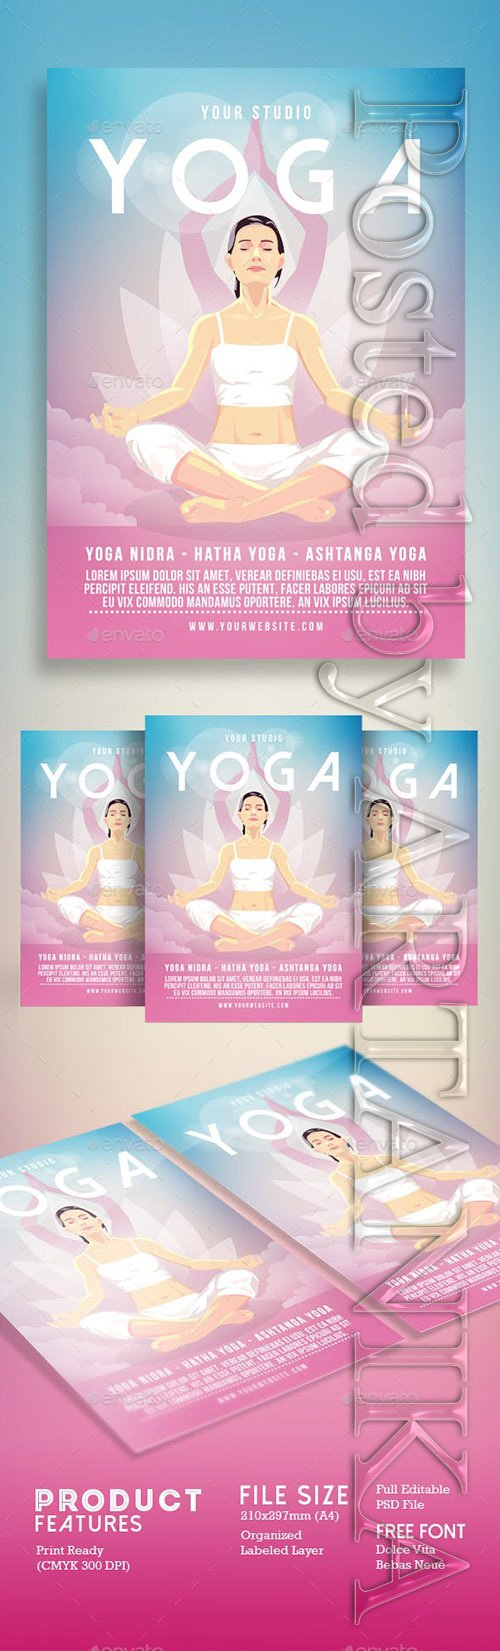 Graphicriver - Yoga Flyer Poster 18307397